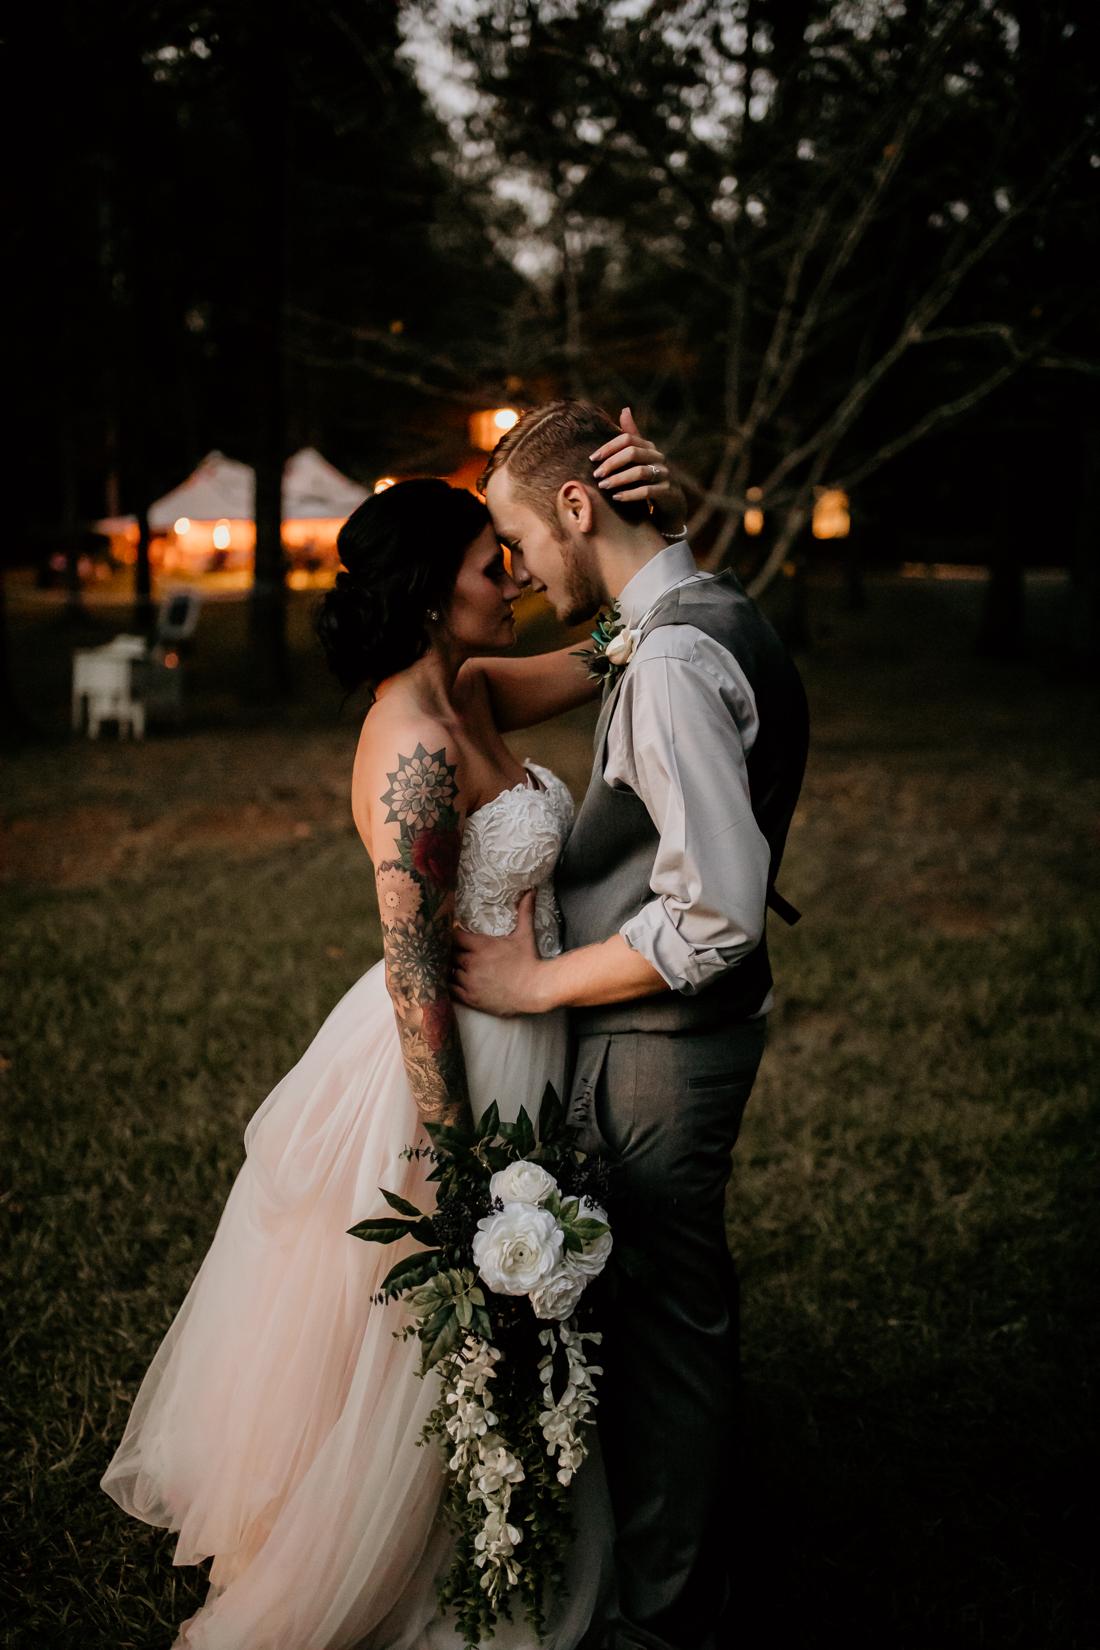 olivia_zay_wedding_09_2018-8859.jpg